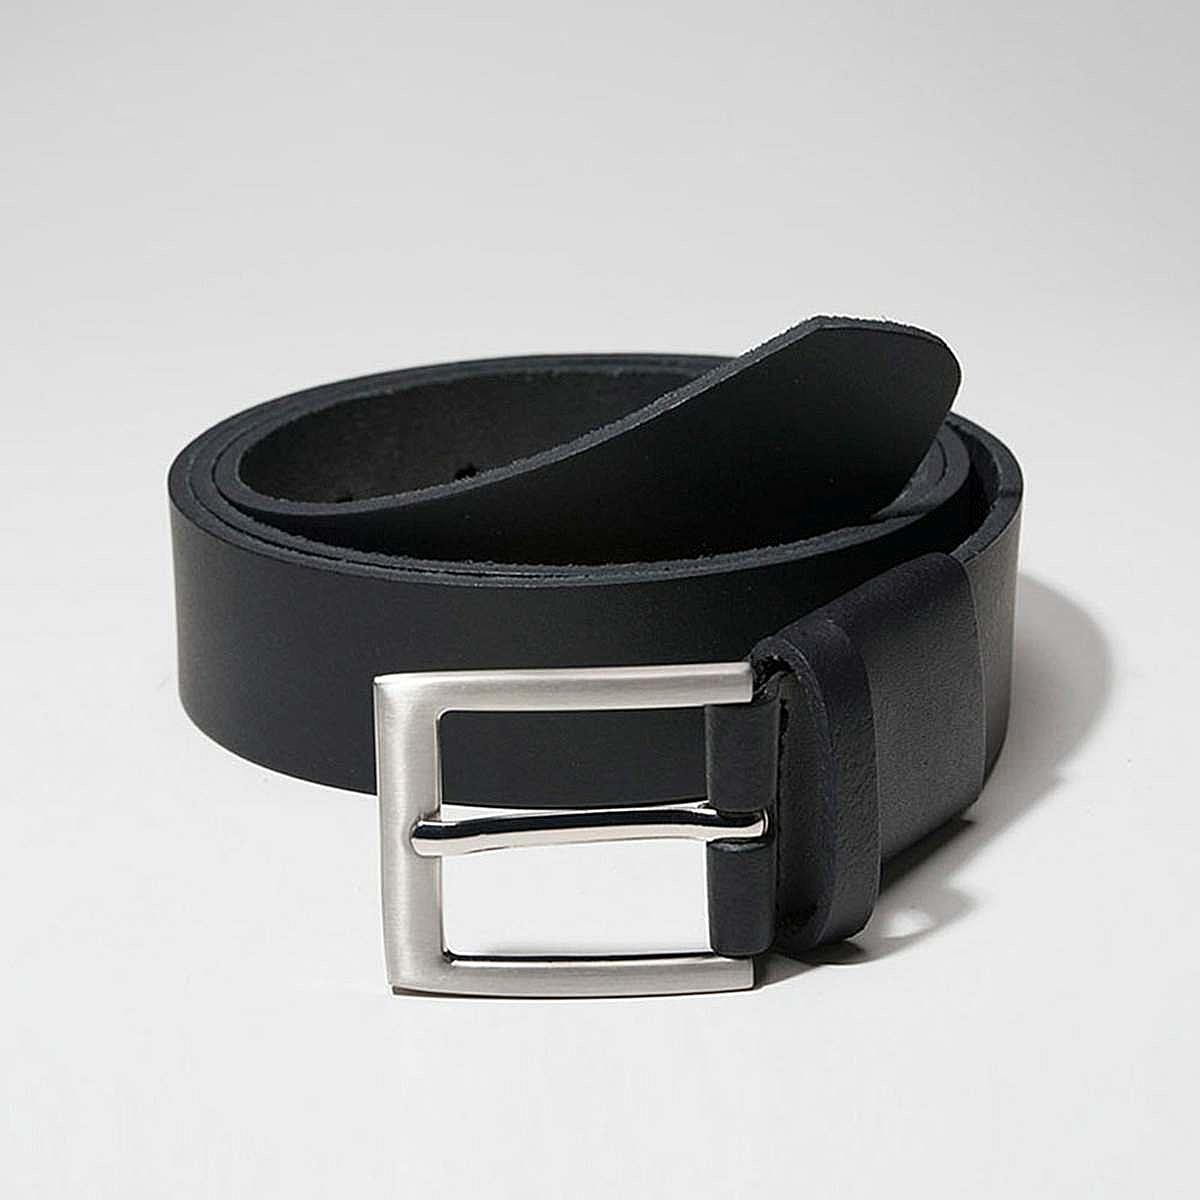 eleganter dehnbund lederg rtel farbe schwarz. Black Bedroom Furniture Sets. Home Design Ideas